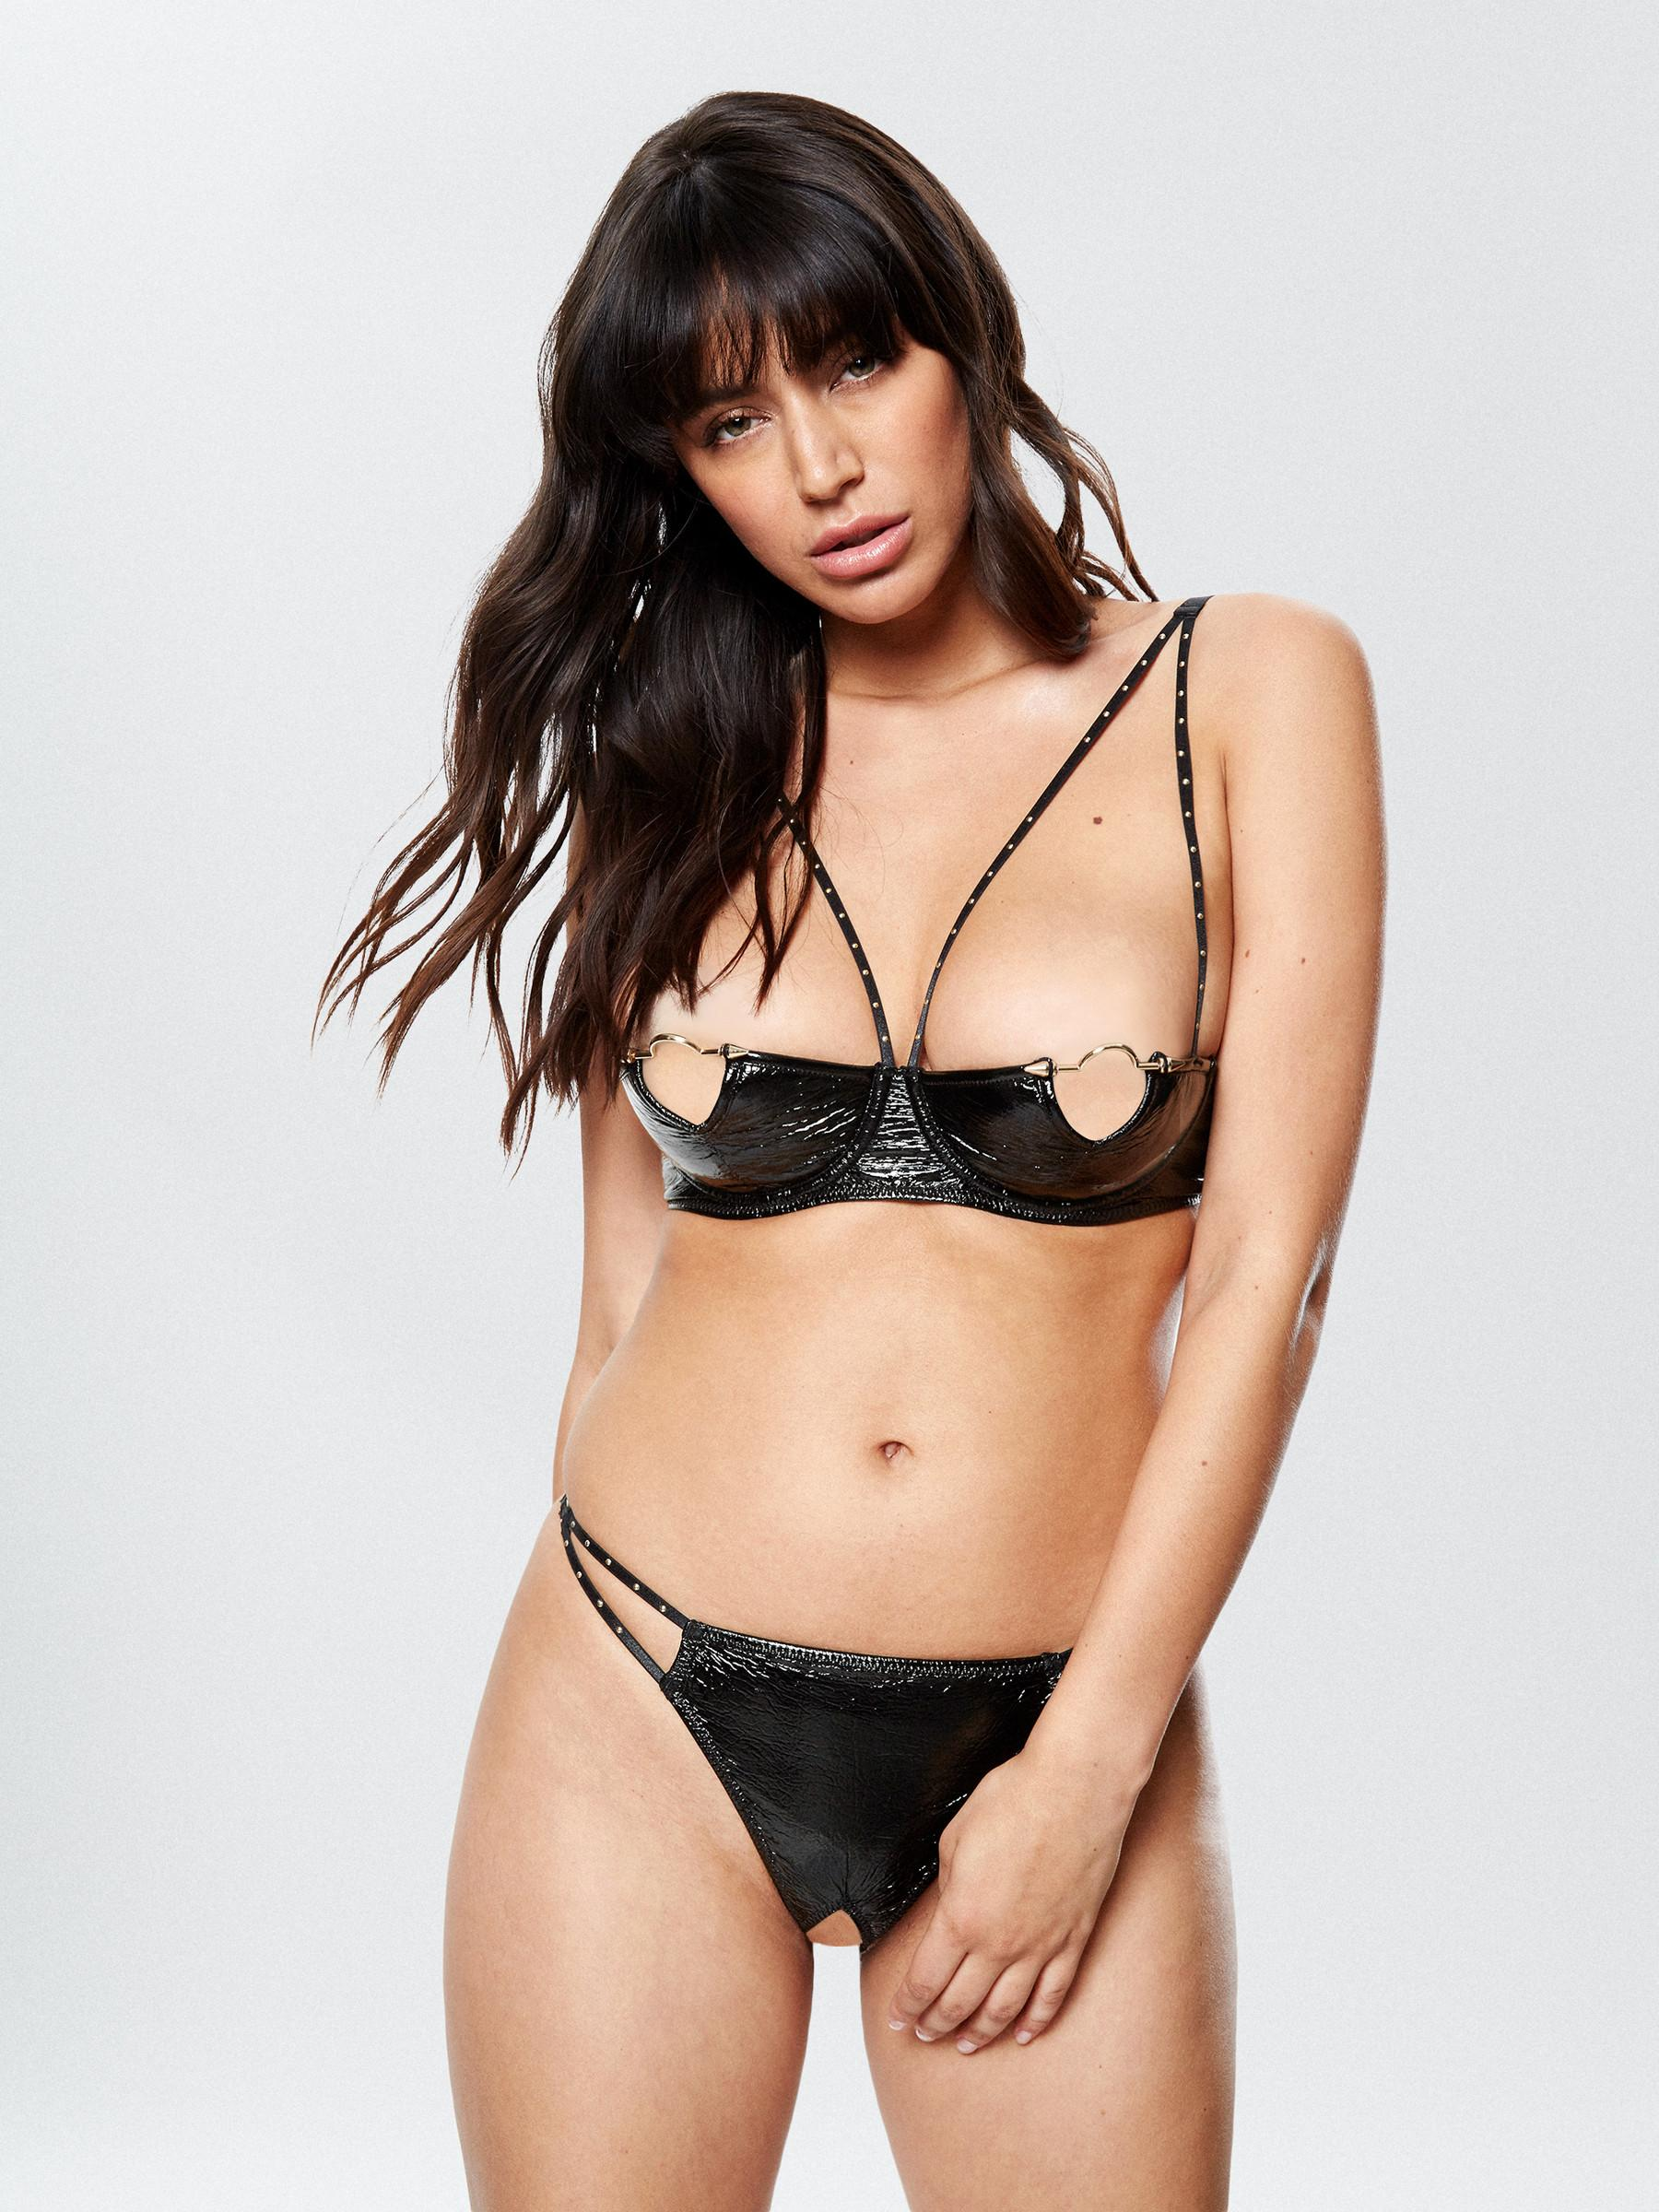 1c0e08fbc0 Details about Ann Summers Womens Ada Set Sexy Quarter Bra Underwire Thong Lingerie  Underwear